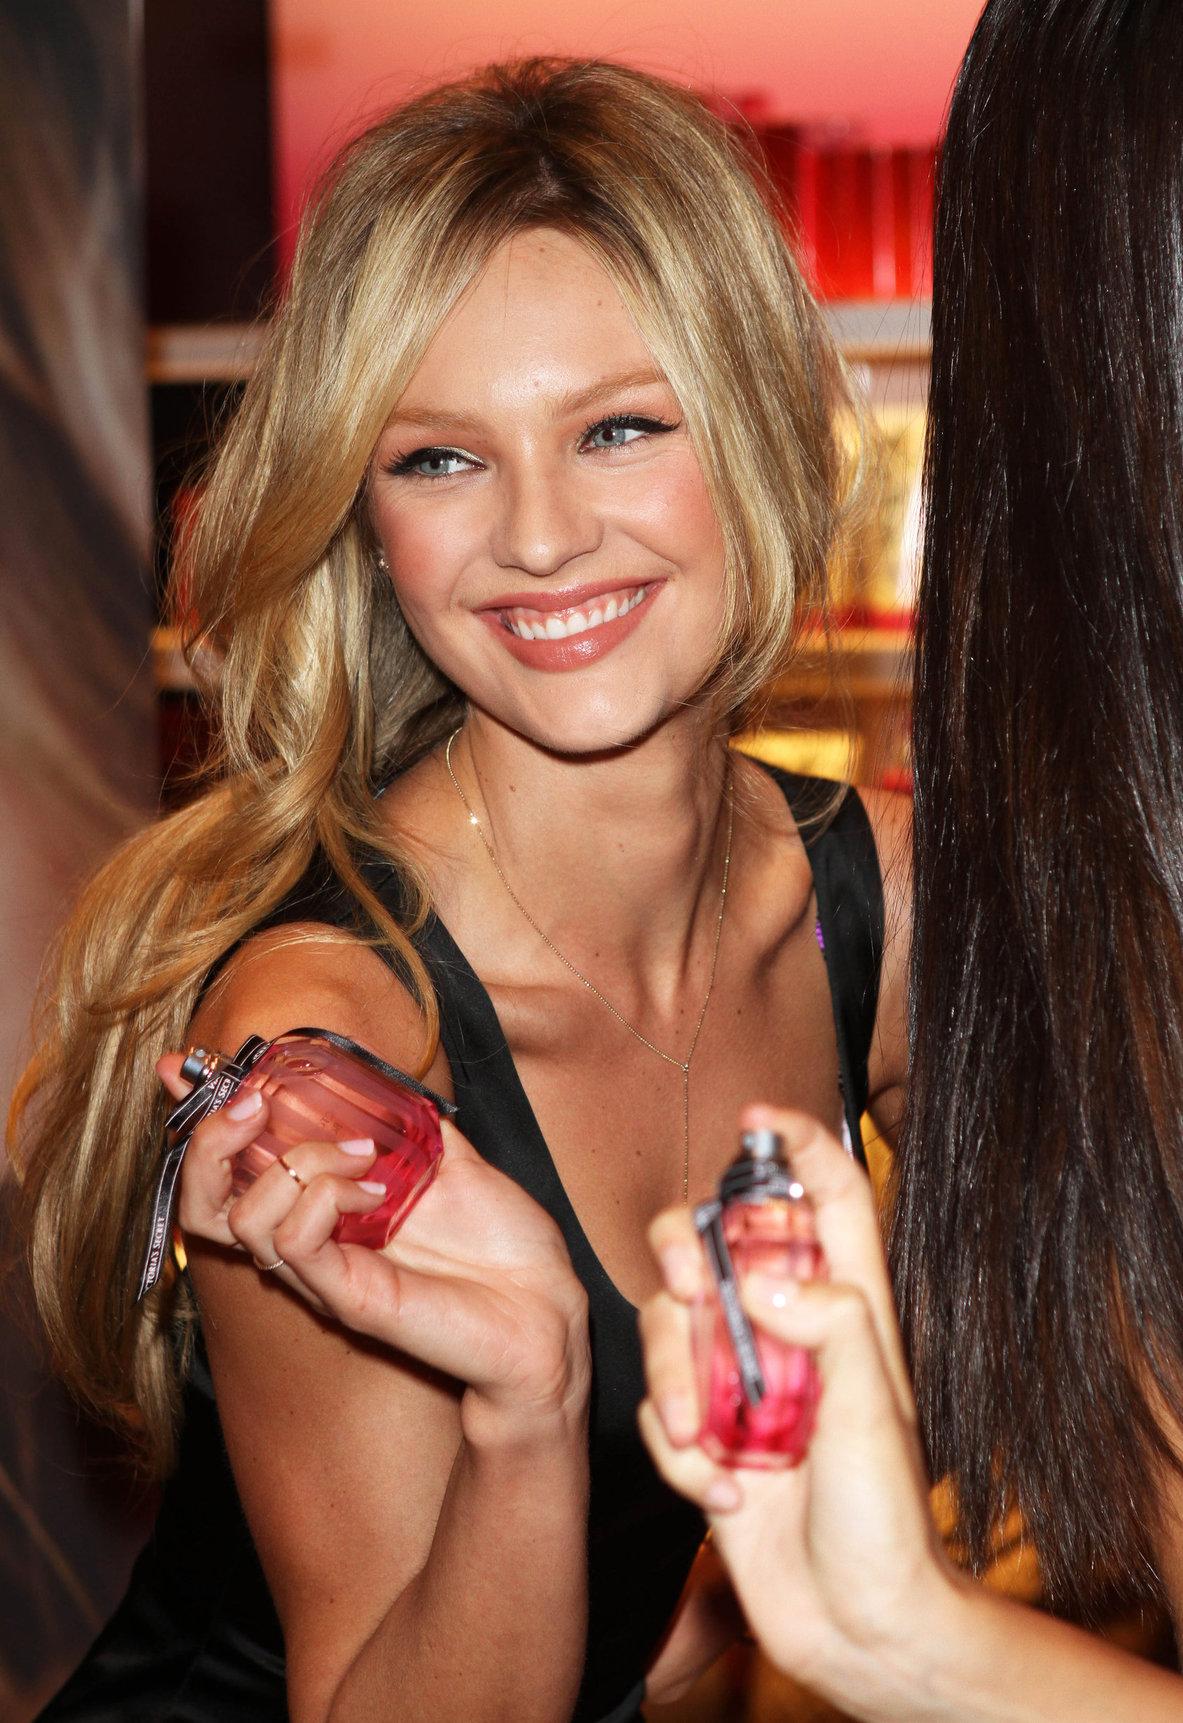 Candice Swanepoel promoting Victoria's Secret Bombshell